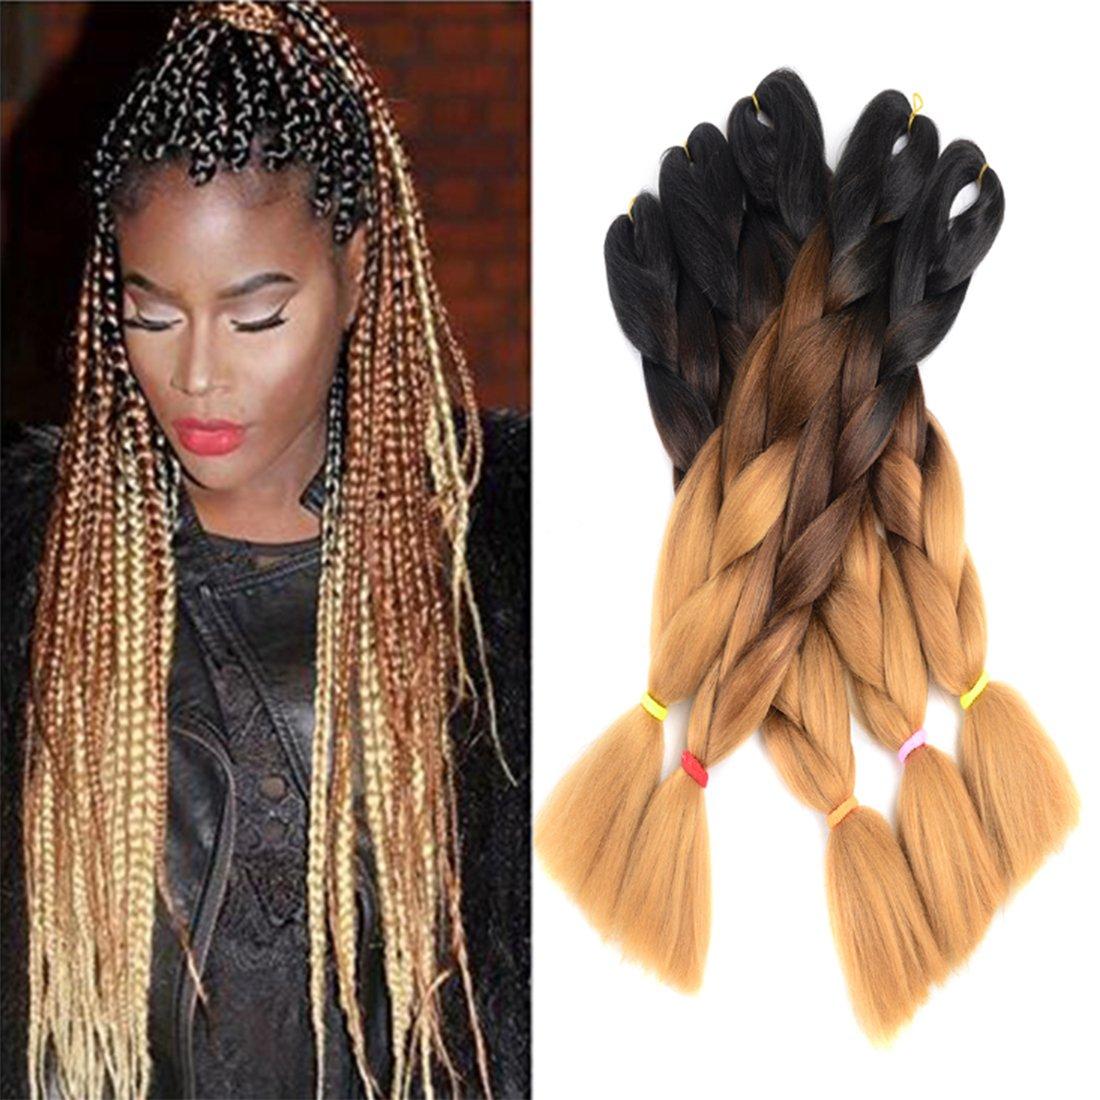 Amazon Ombre Jumbo Braid Hair Extensions 24 5pcslot 100gpc